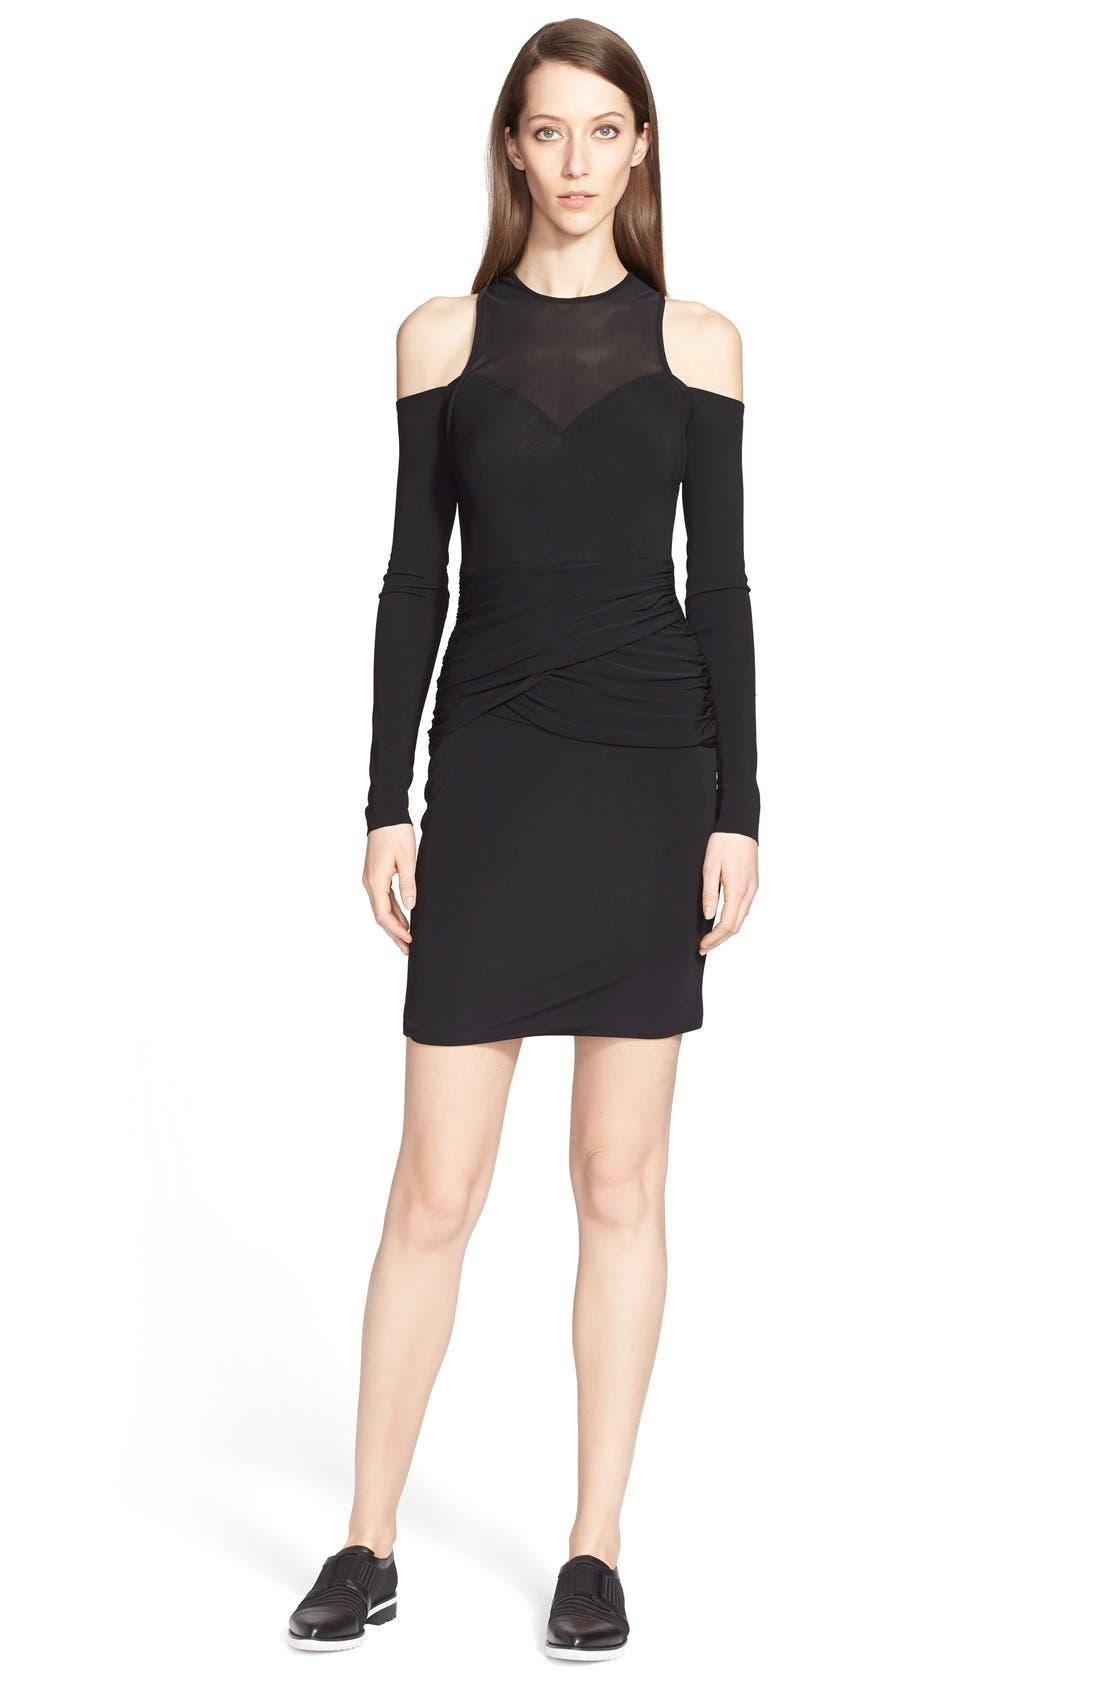 Alternate Image 1 Selected - Yigal Azrouël Cold Shoulder Jersey Dress